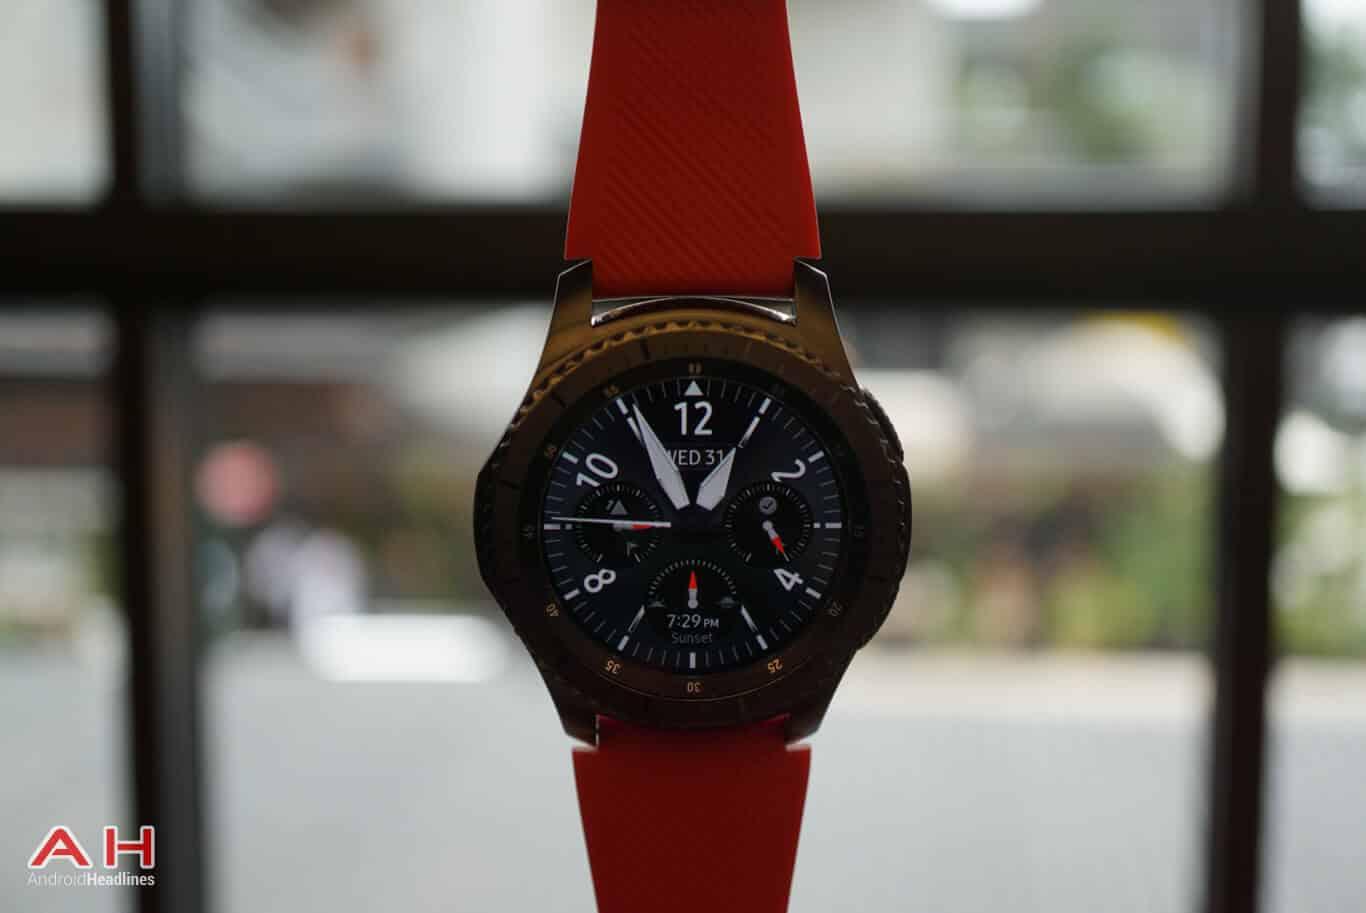 Samsung Gear S3 AH 37